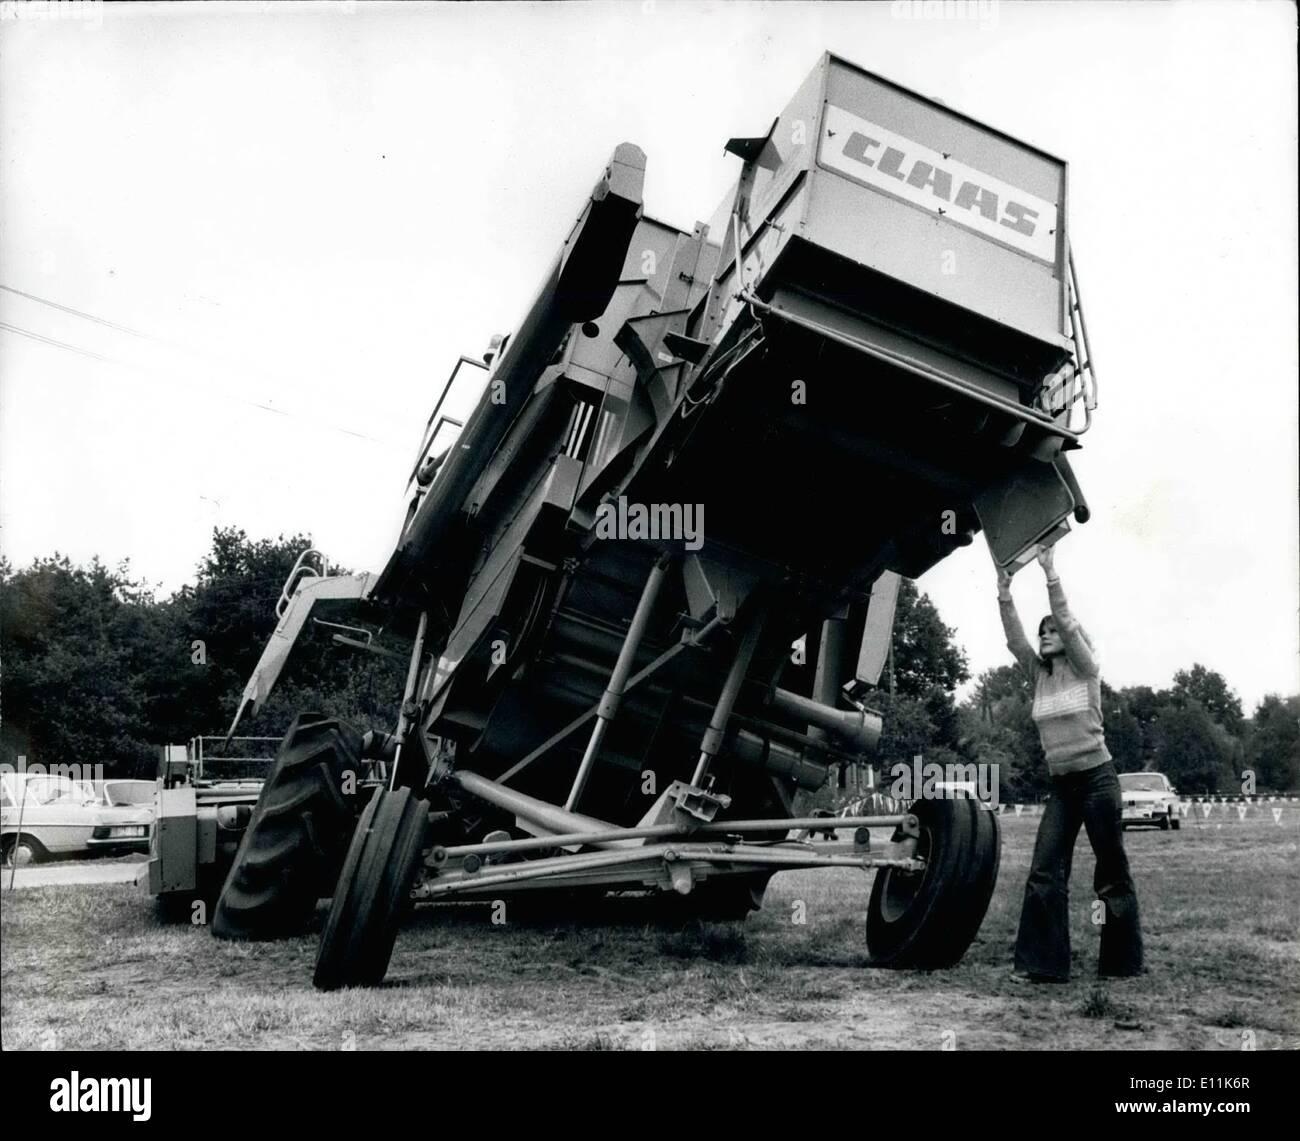 Sep  09, 1978 - Combine Harvester: A Combine harvester, developed in